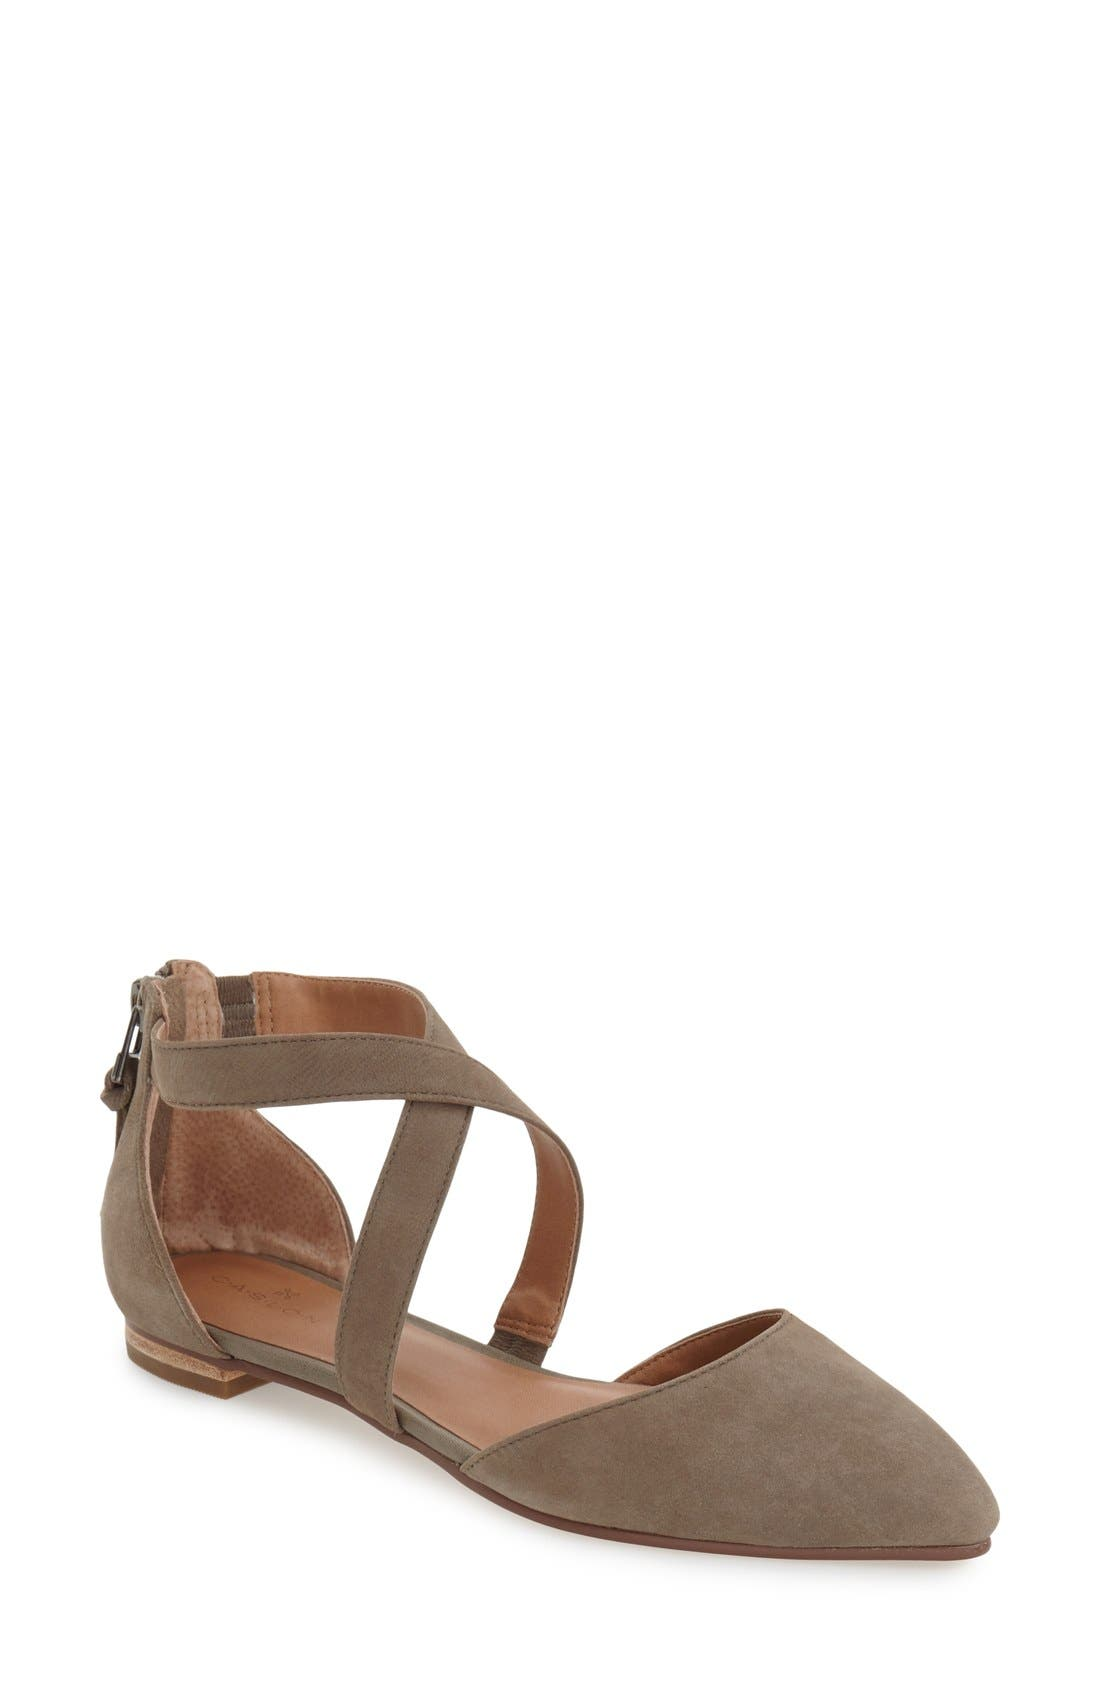 Alternate Image 1 Selected - Caslon® 'Aubry' Pointy Toe Flat (Women)